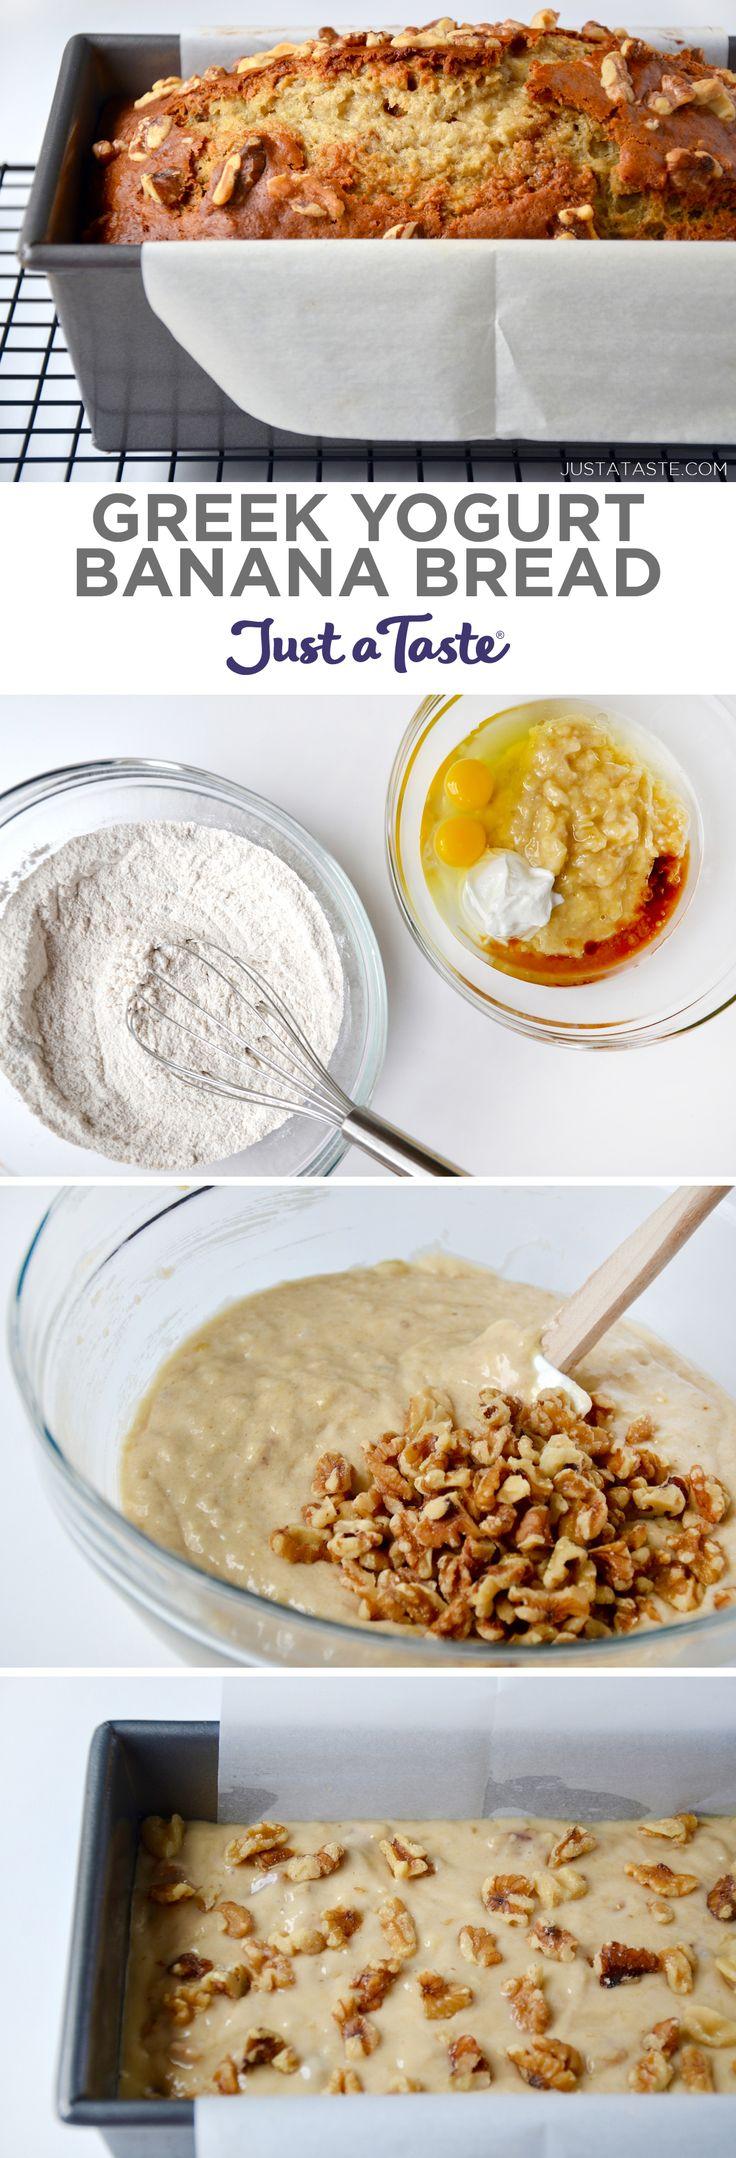 Greek Yogurt Banana Bread recipe from justataste.com #healthy #recipe